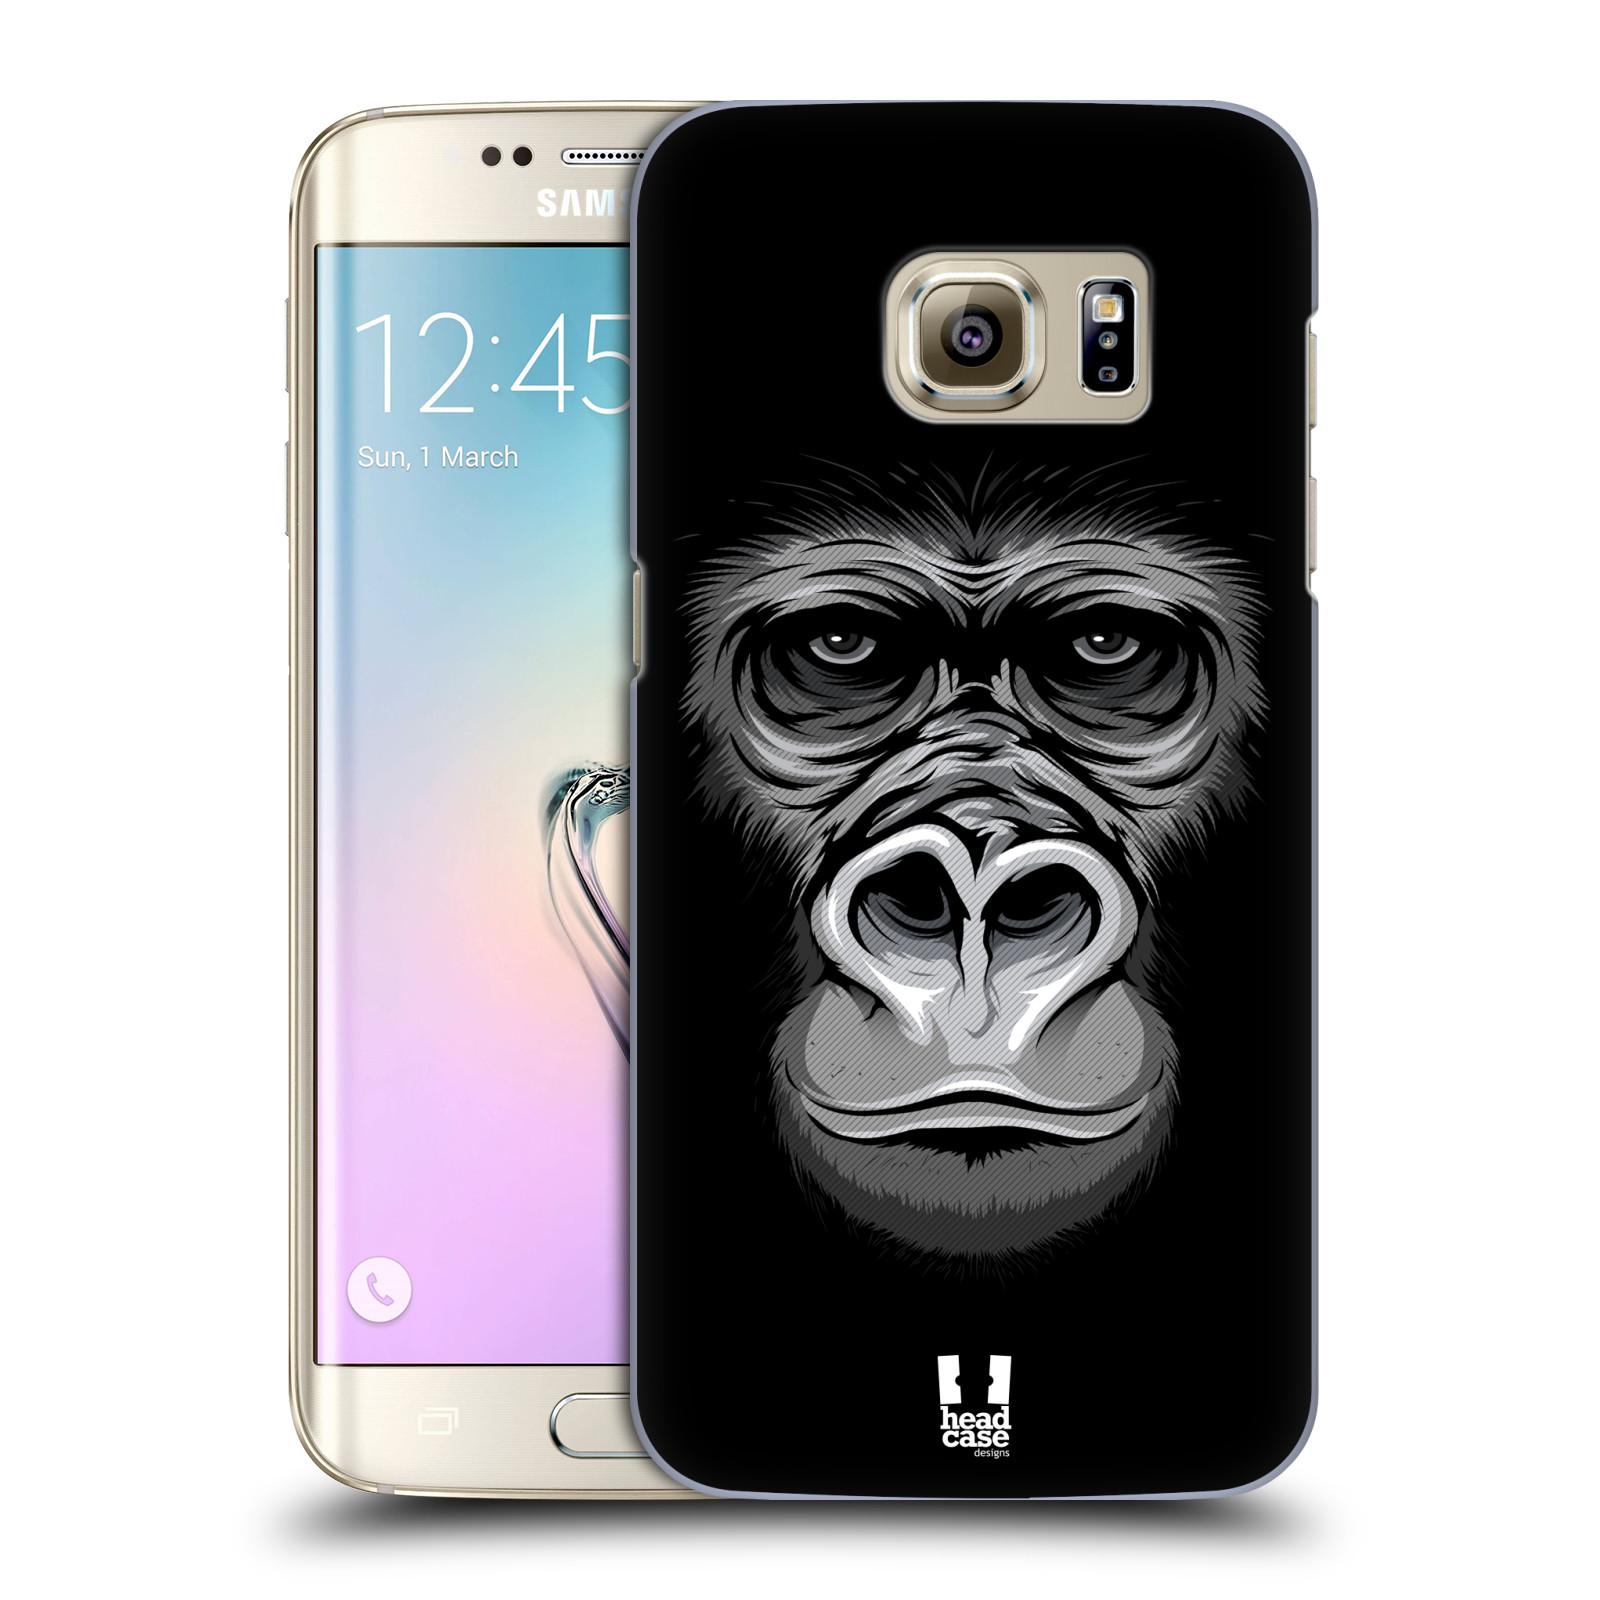 HEAD CASE plastový obal na mobil SAMSUNG GALAXY S7 EDGE vzor Zvíře kreslená tvář 2 gorila